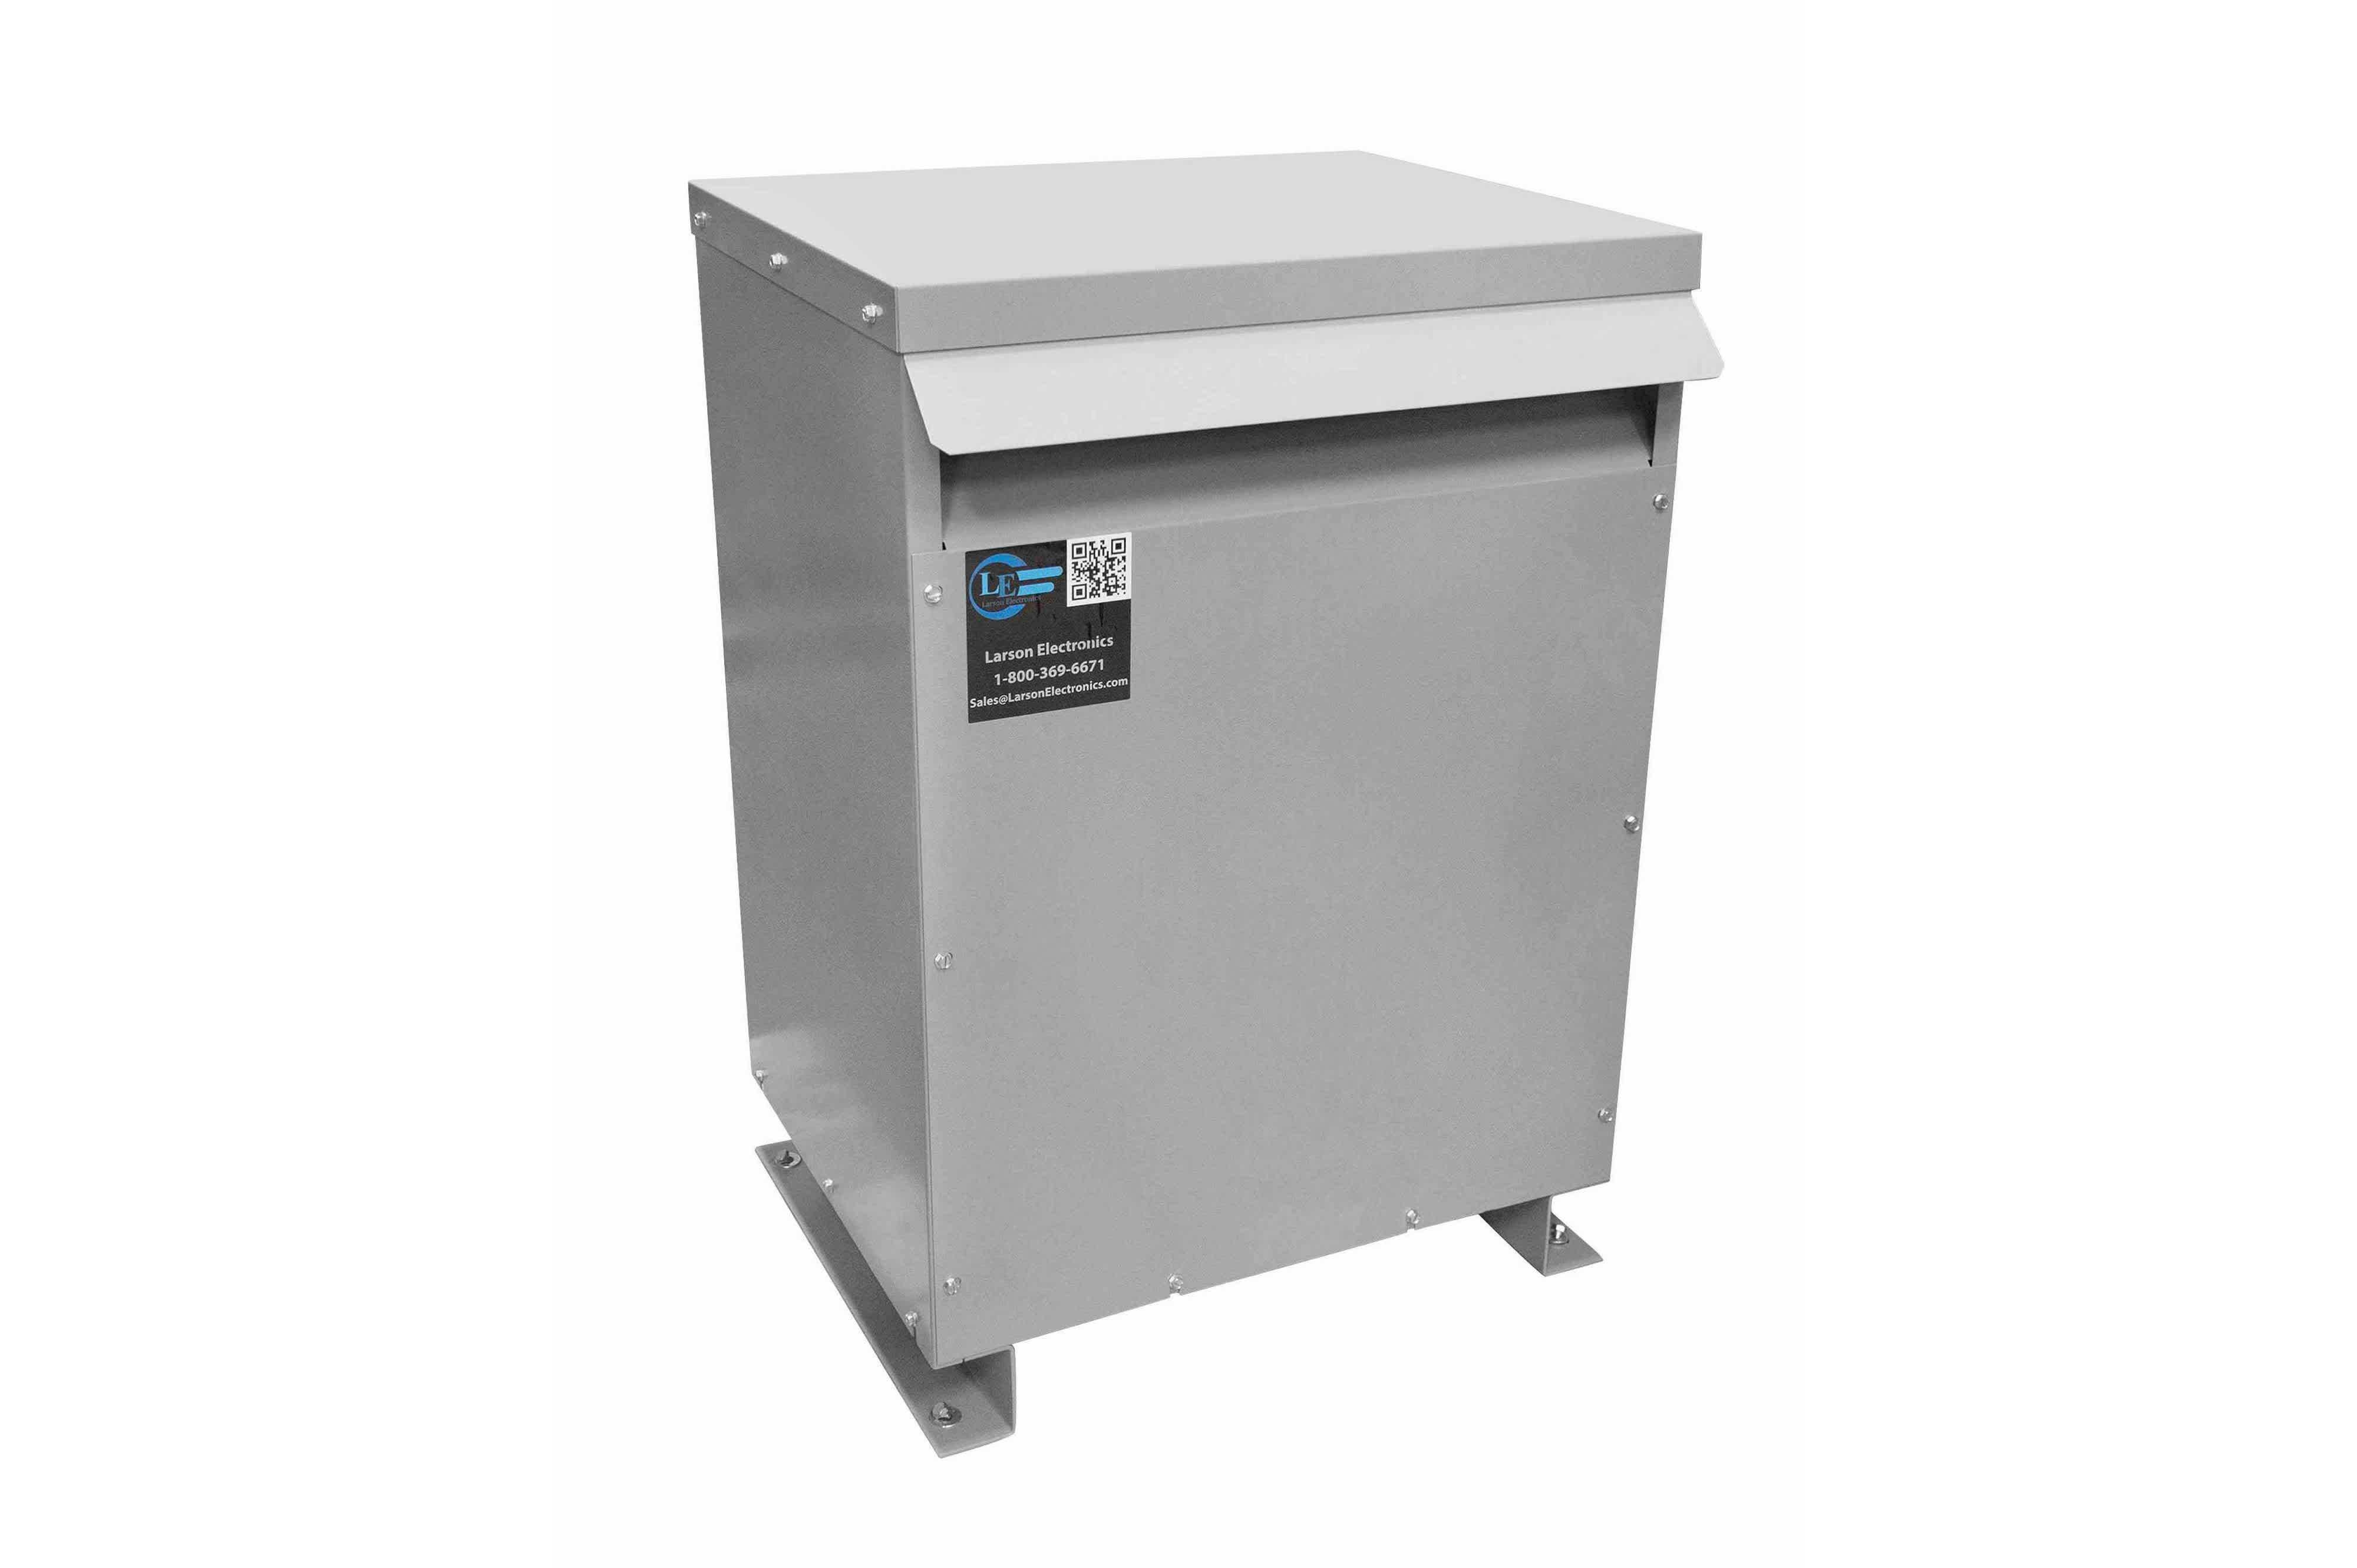 26 kVA 3PH Isolation Transformer, 600V Wye Primary, 480Y/277 Wye-N Secondary, N3R, Ventilated, 60 Hz